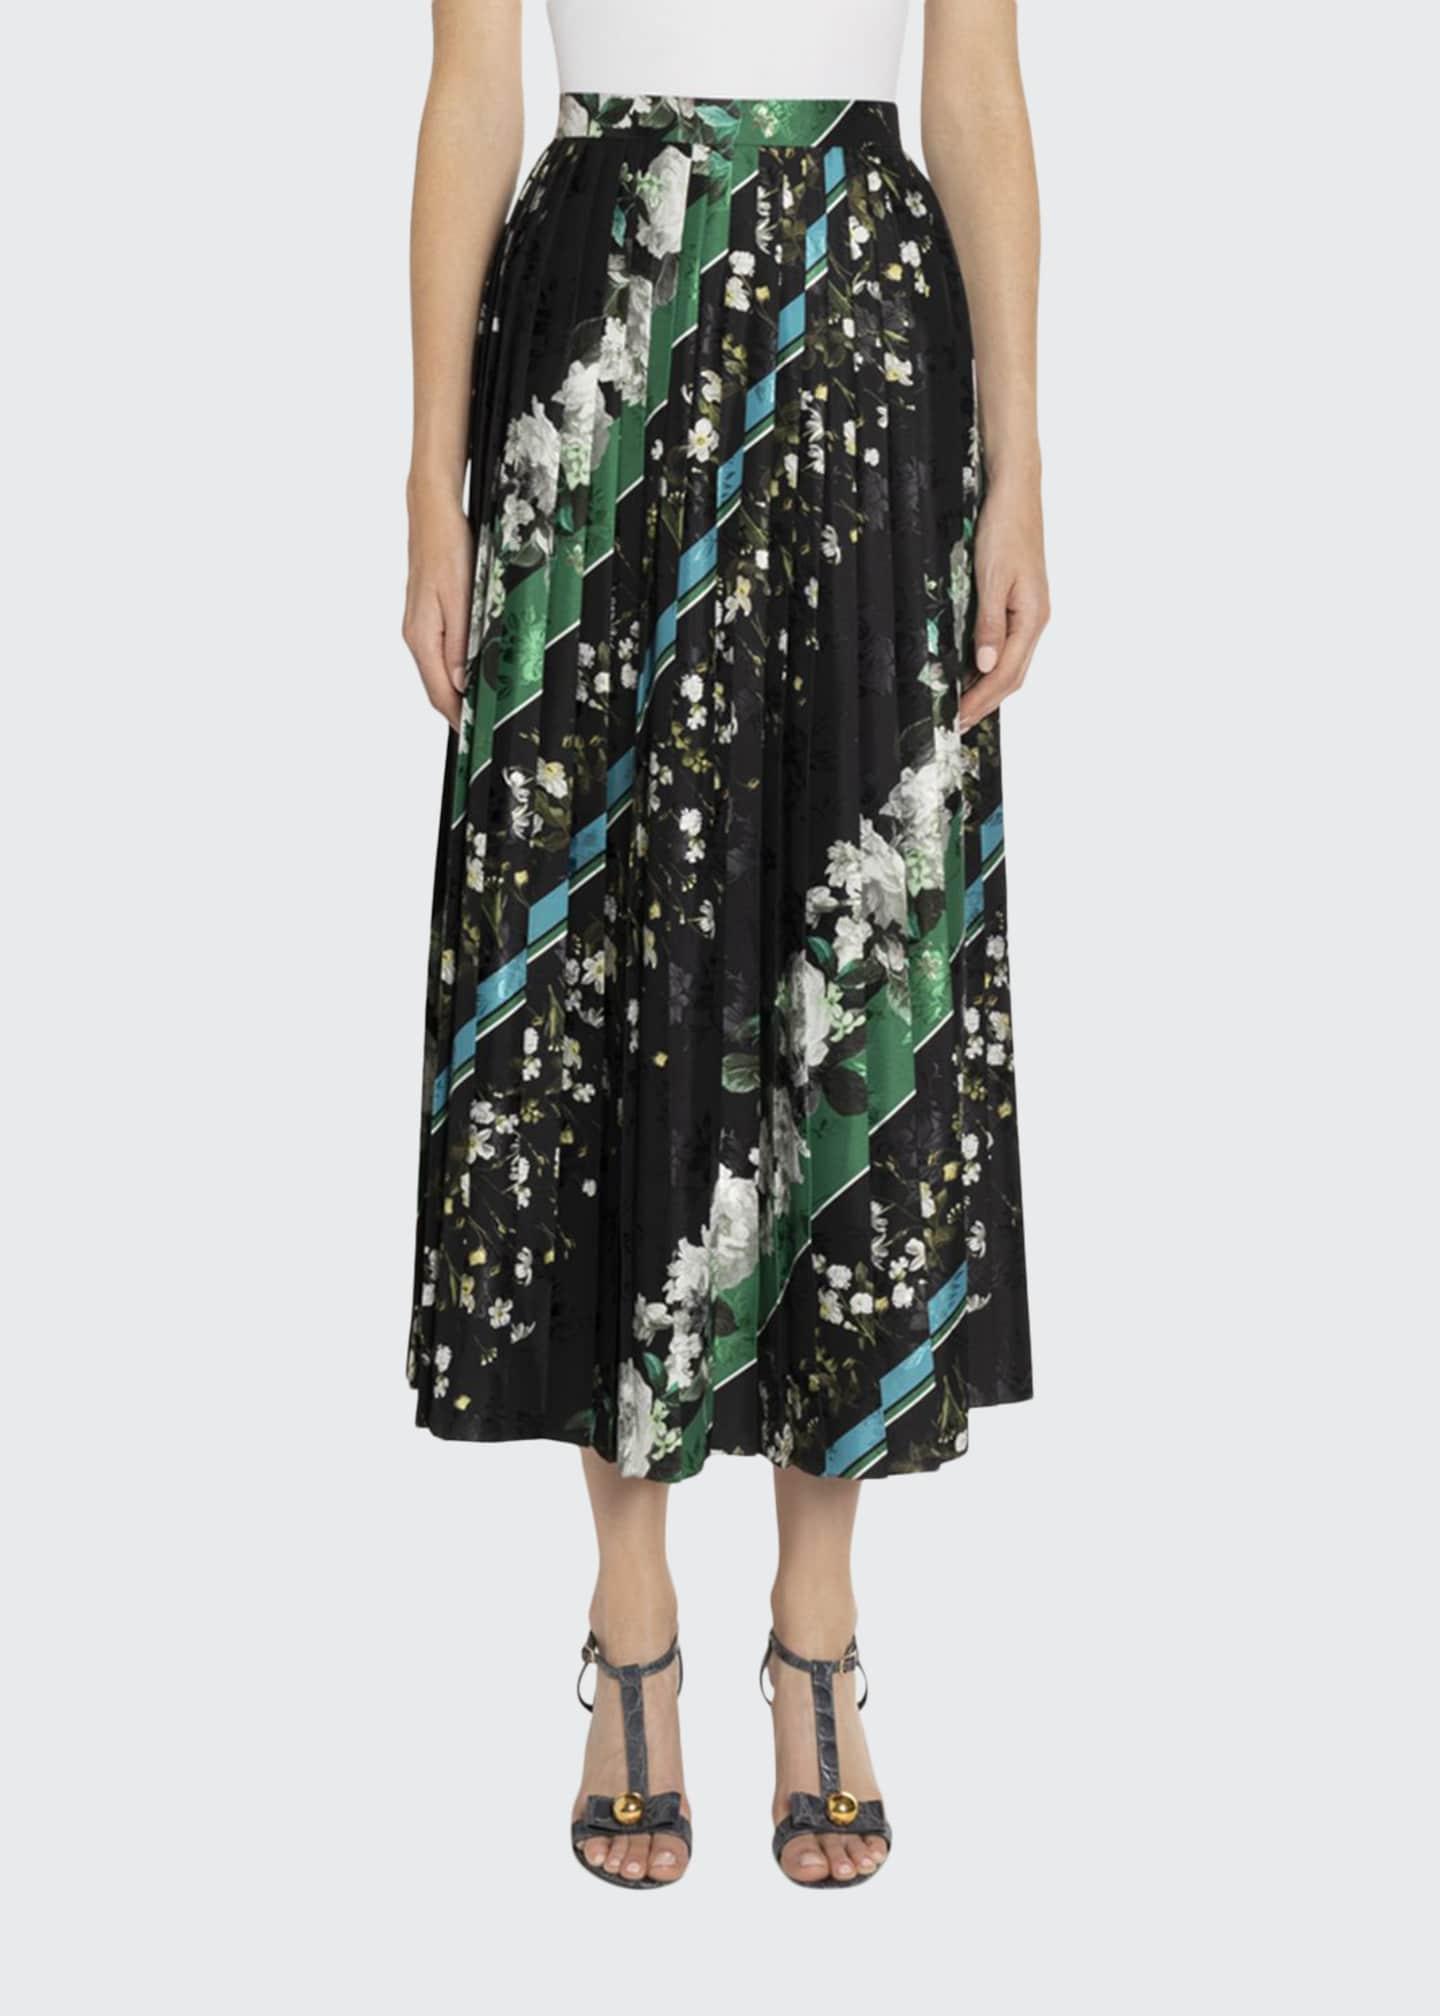 Erdem Nolana Floral & Striped Pleated Maxi Skirt